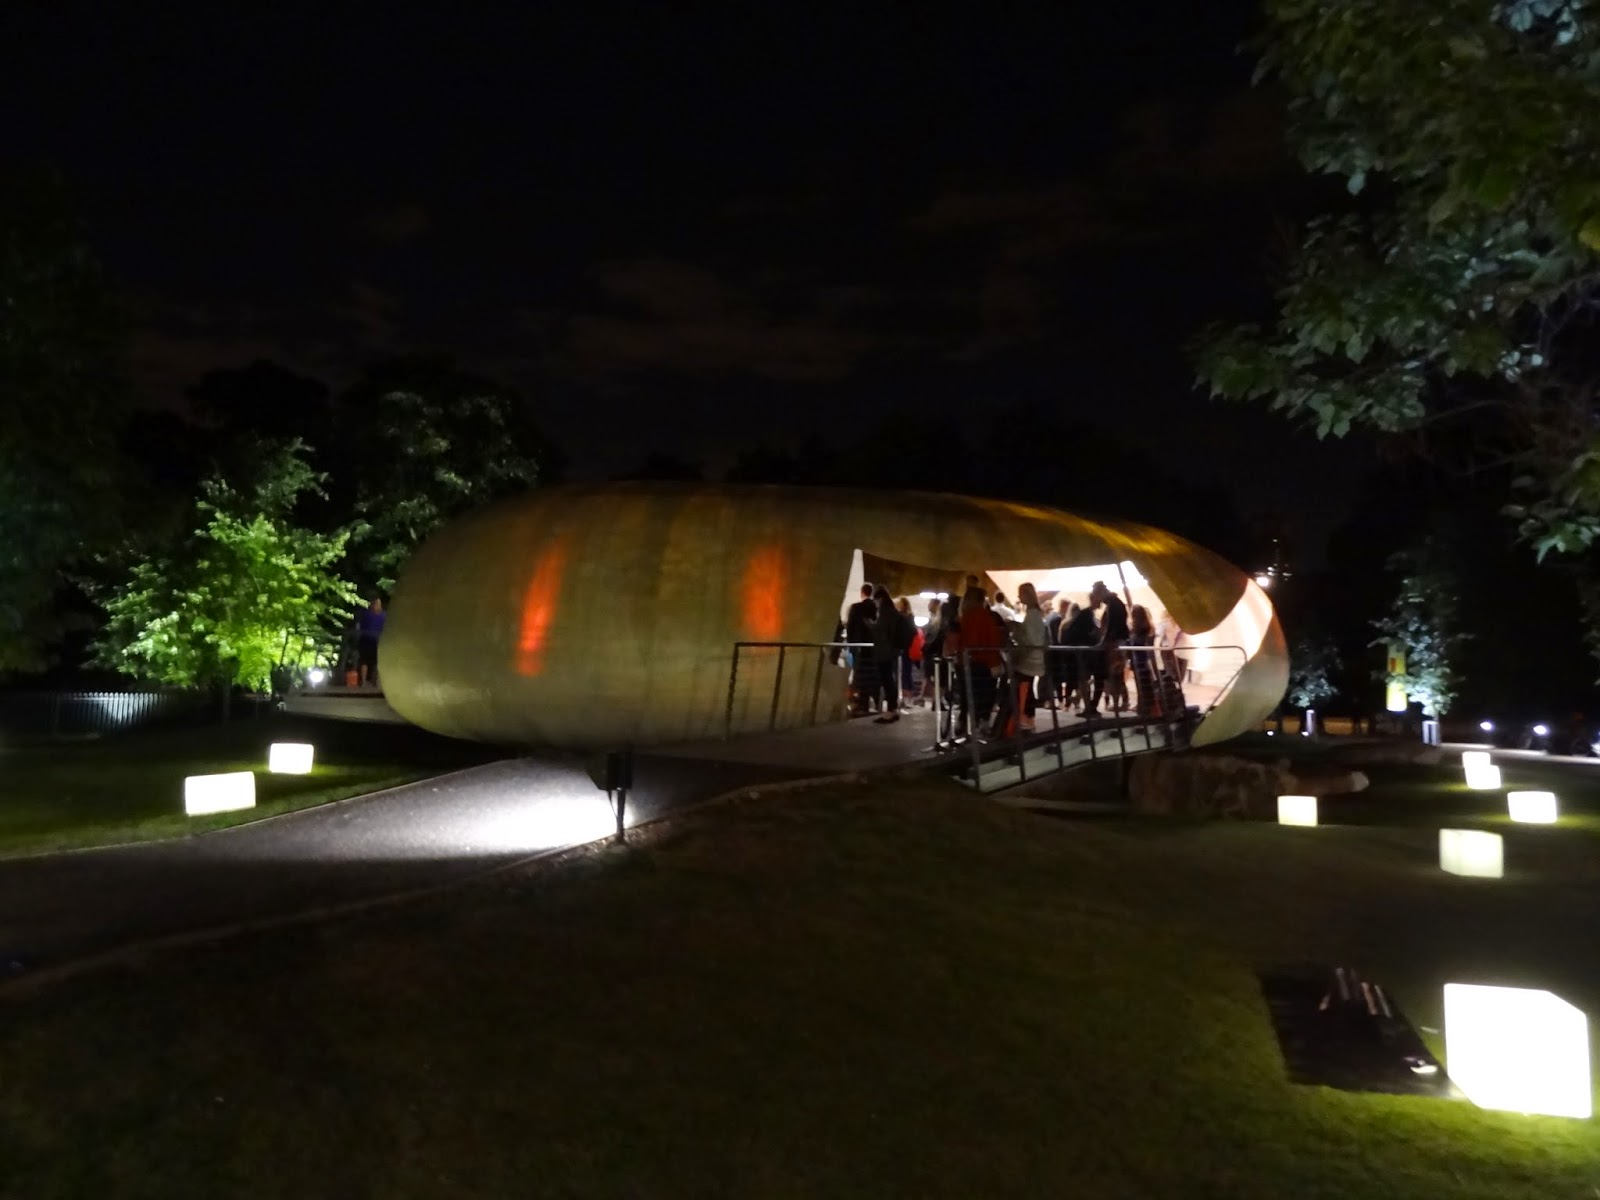 Serpentine Pavilion Hyde Park lululemon Yoga Event Night